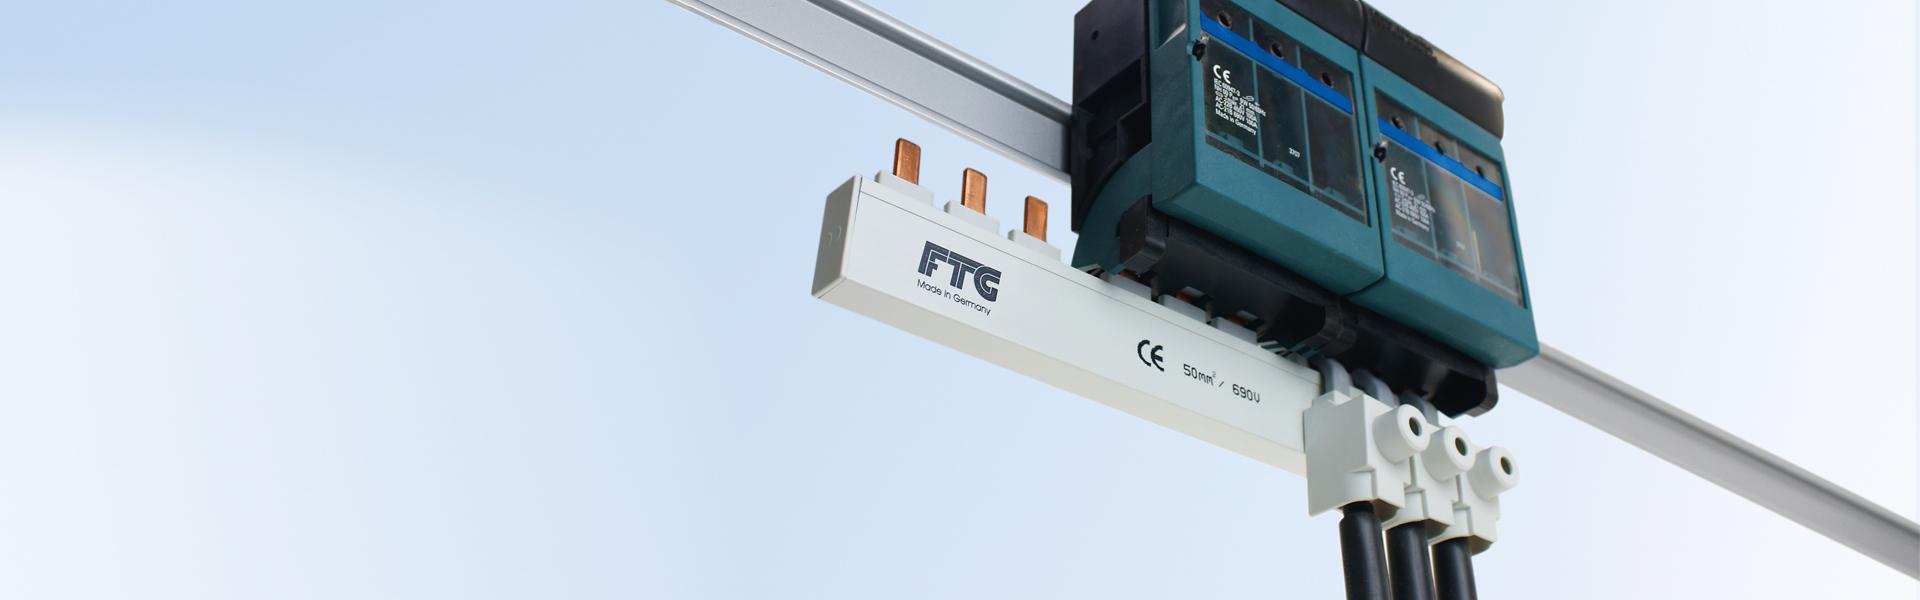 FTG-NH-Trenner_7153SD-Anwendung